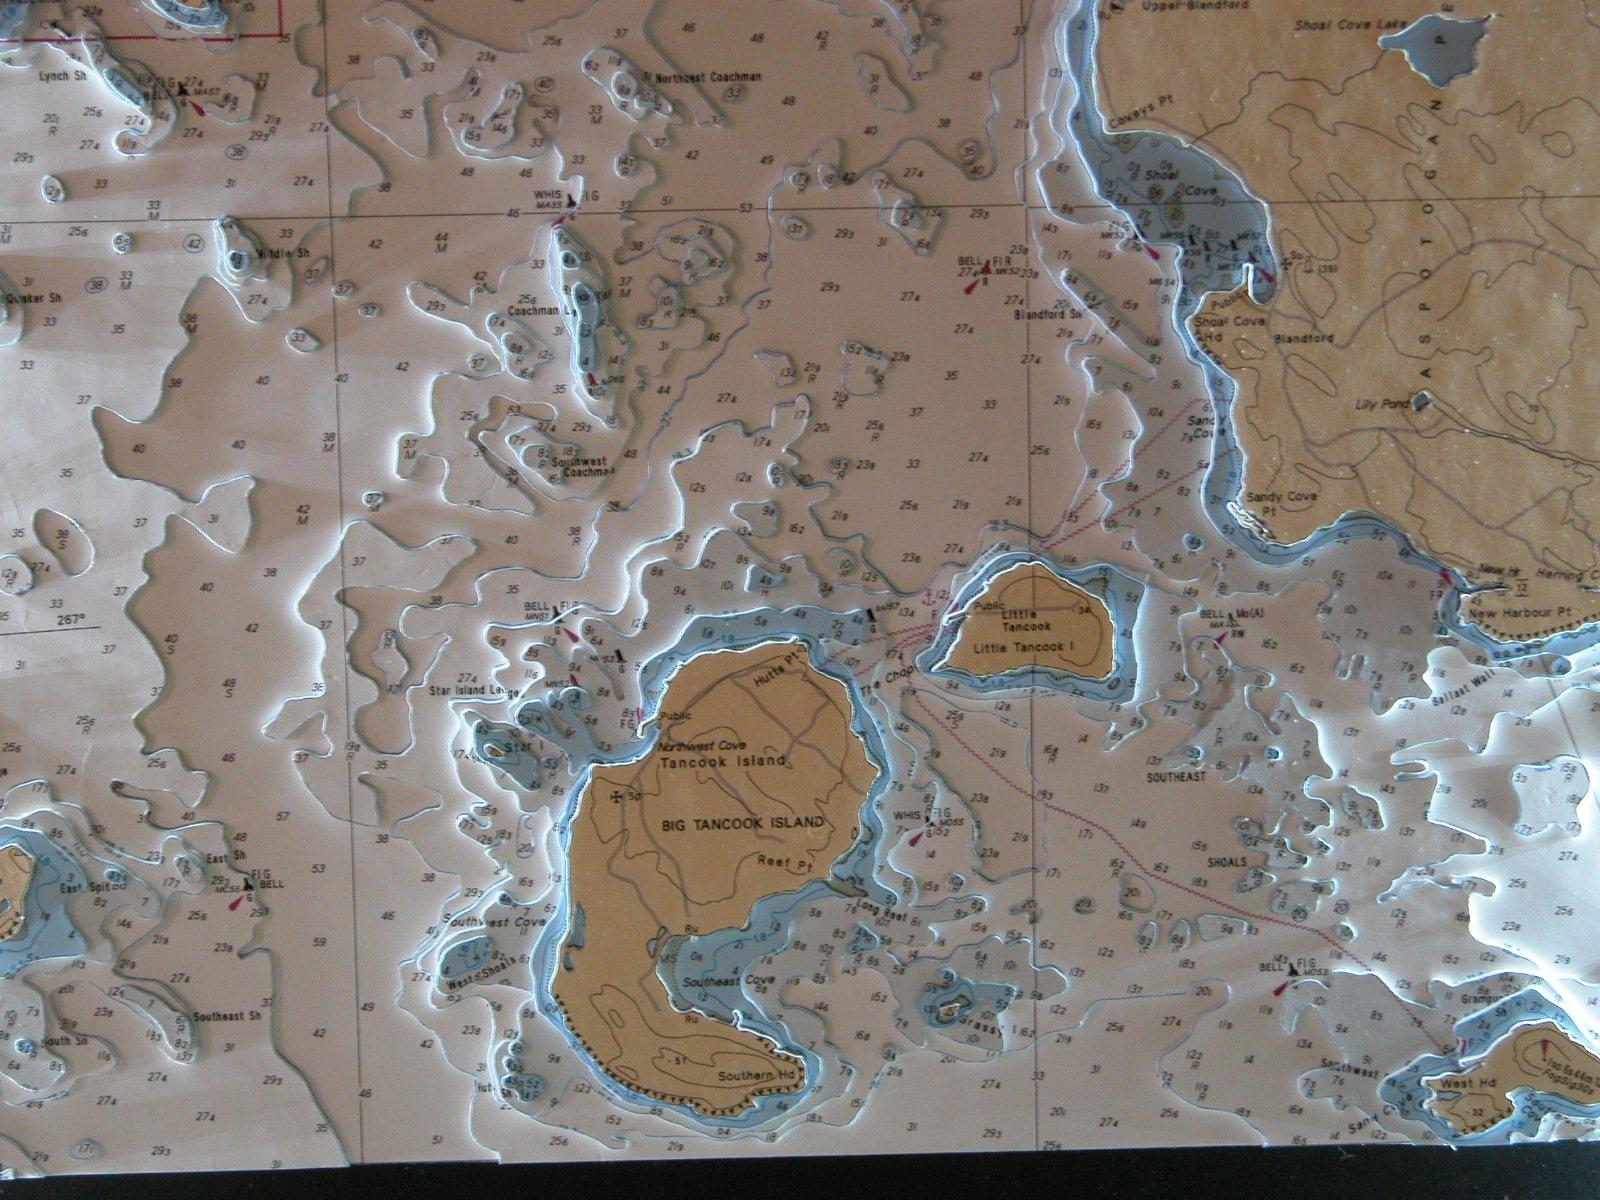 Mahone Bay Latitude Kinsale